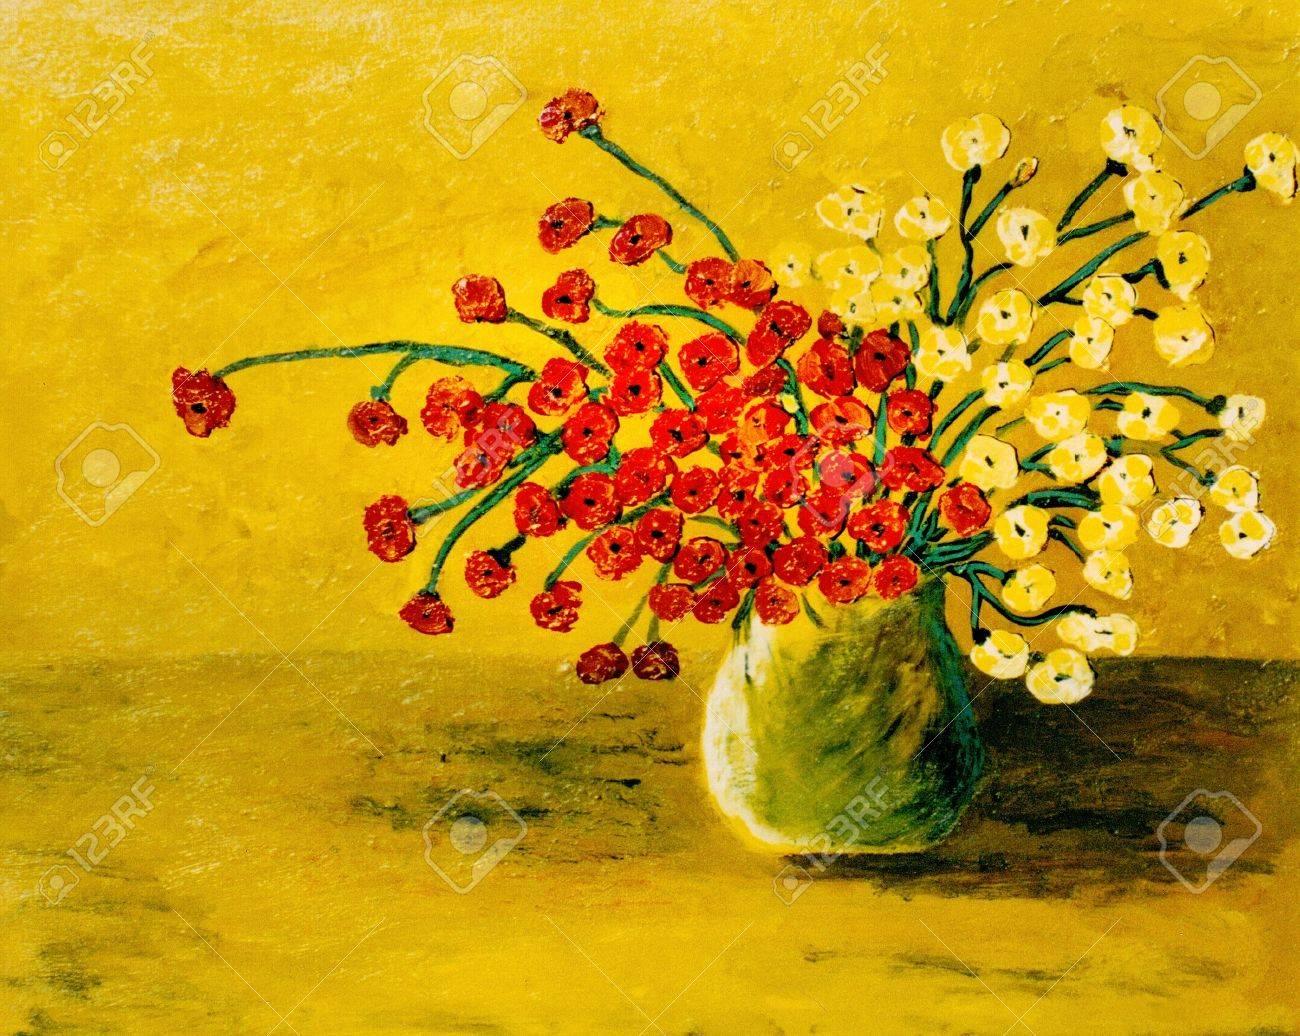 Very Nice original oil Painting On Canvas Stock Photo - 11869828